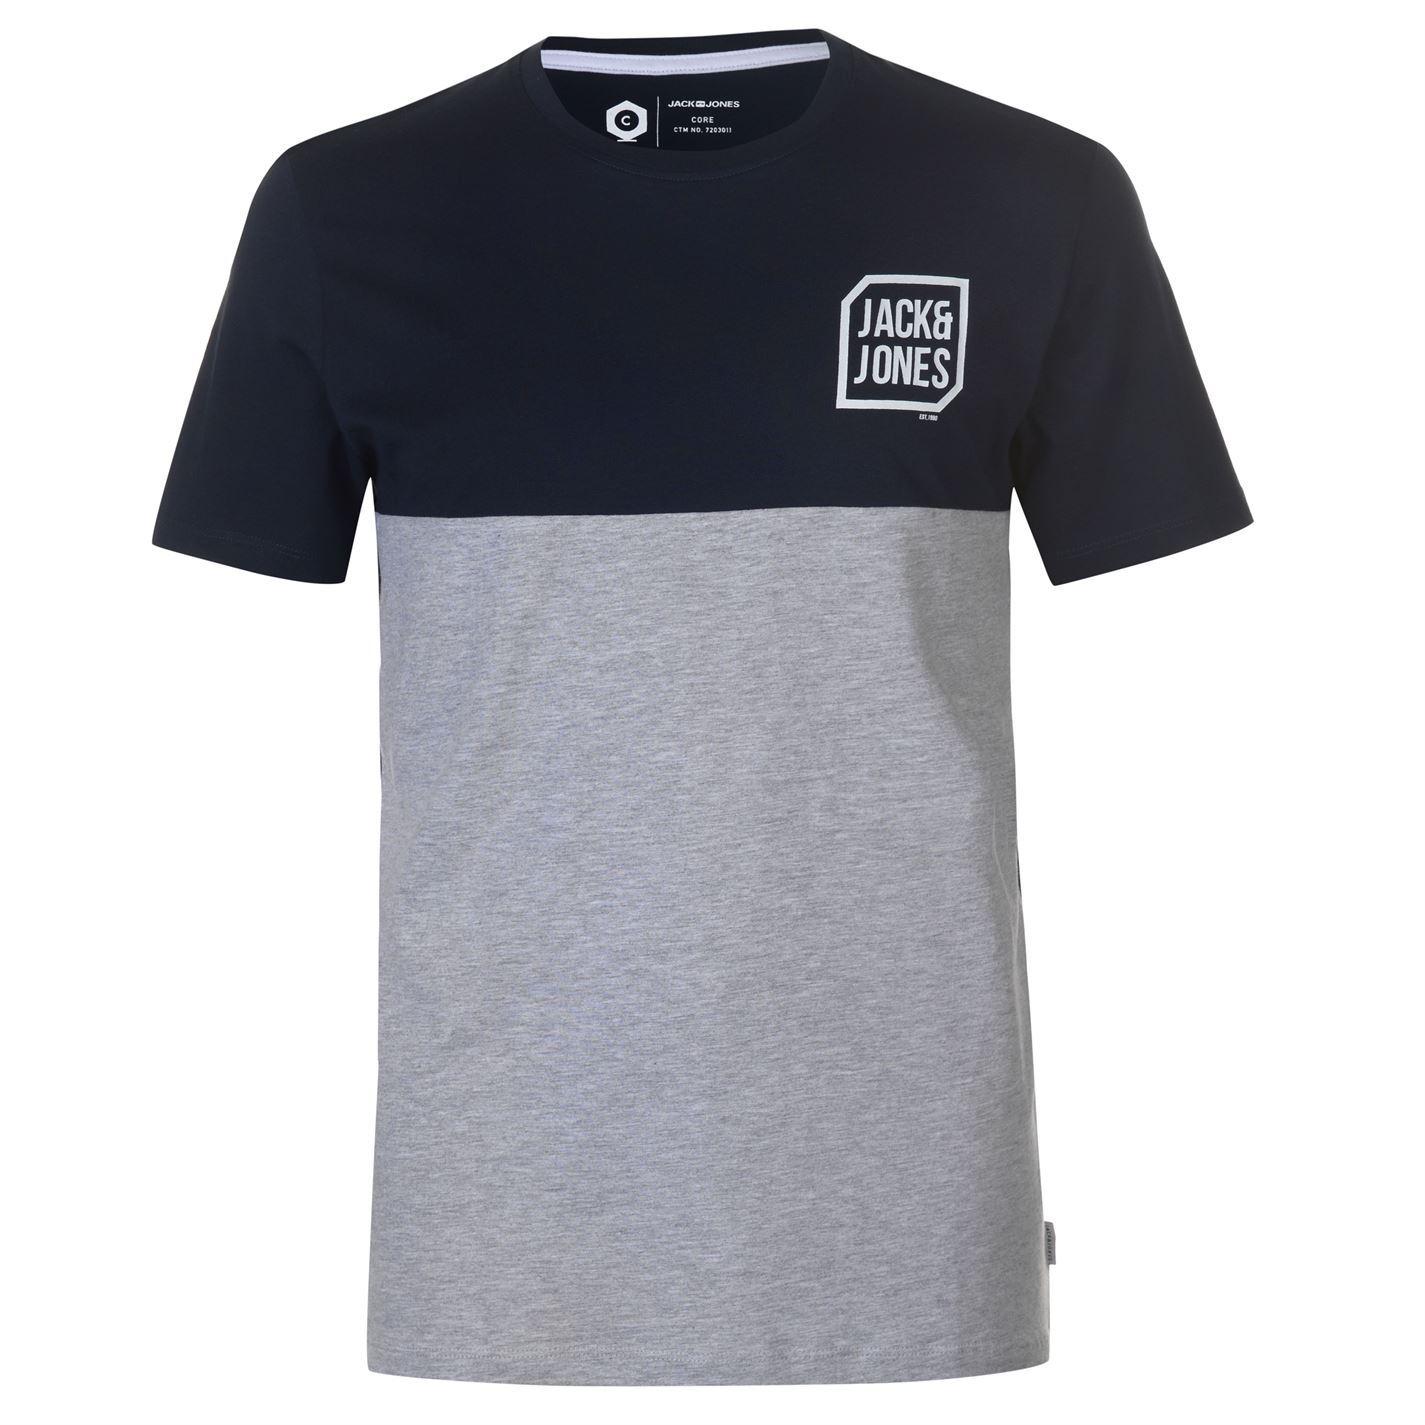 Jack-and-Jones-Core-Tern-T-Shirt-Mens-Tee-Shirt-Top thumbnail 3